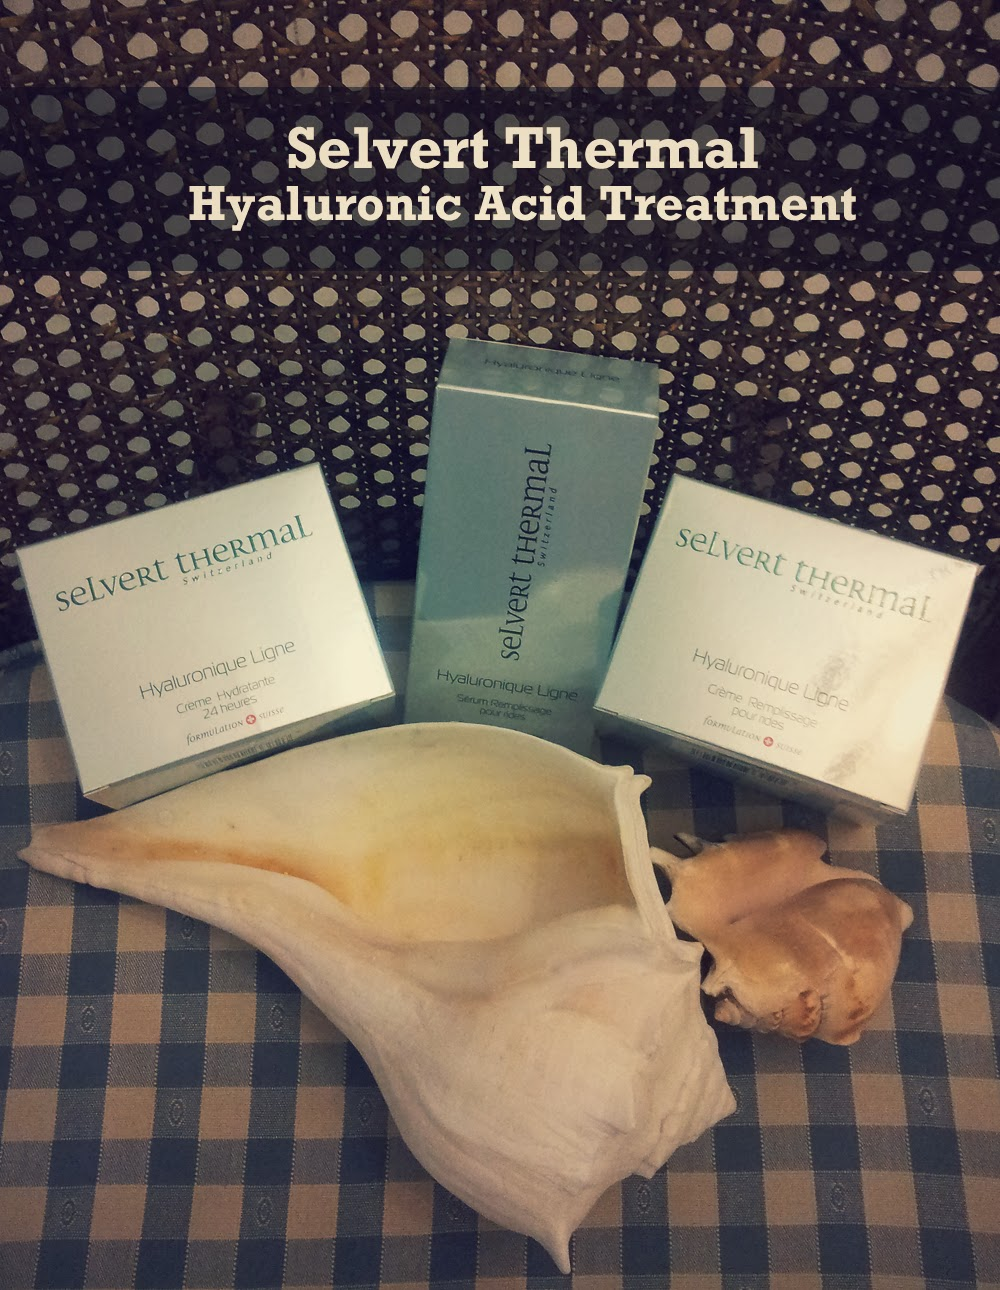 Selvert+Thermal+Hyaluronic+Acid+Treatment